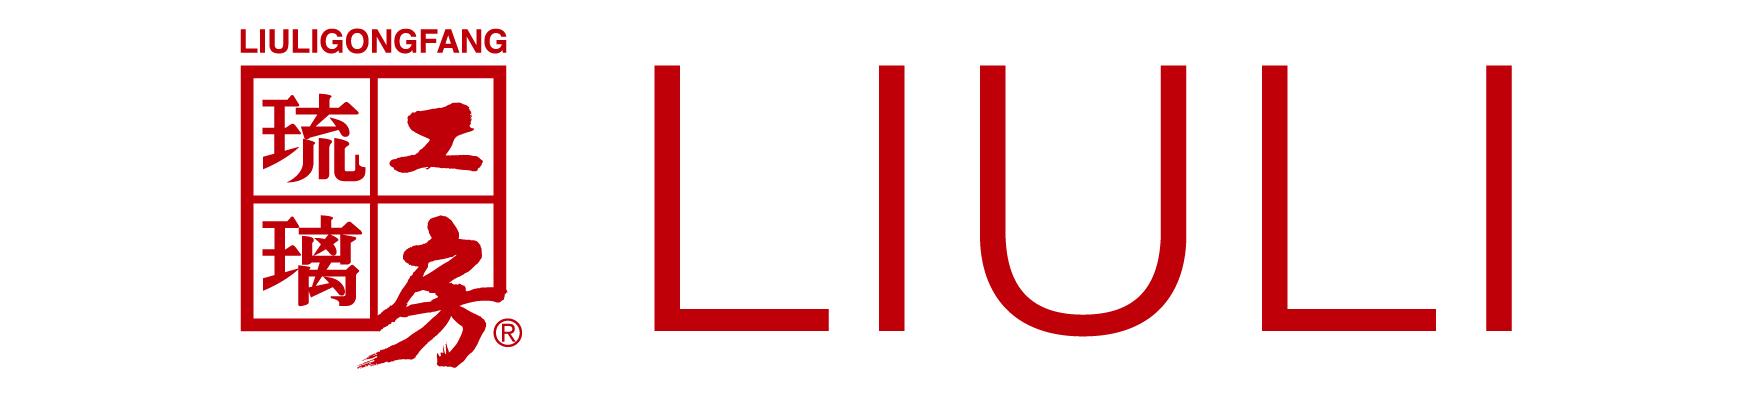 LIULI Crystal Art